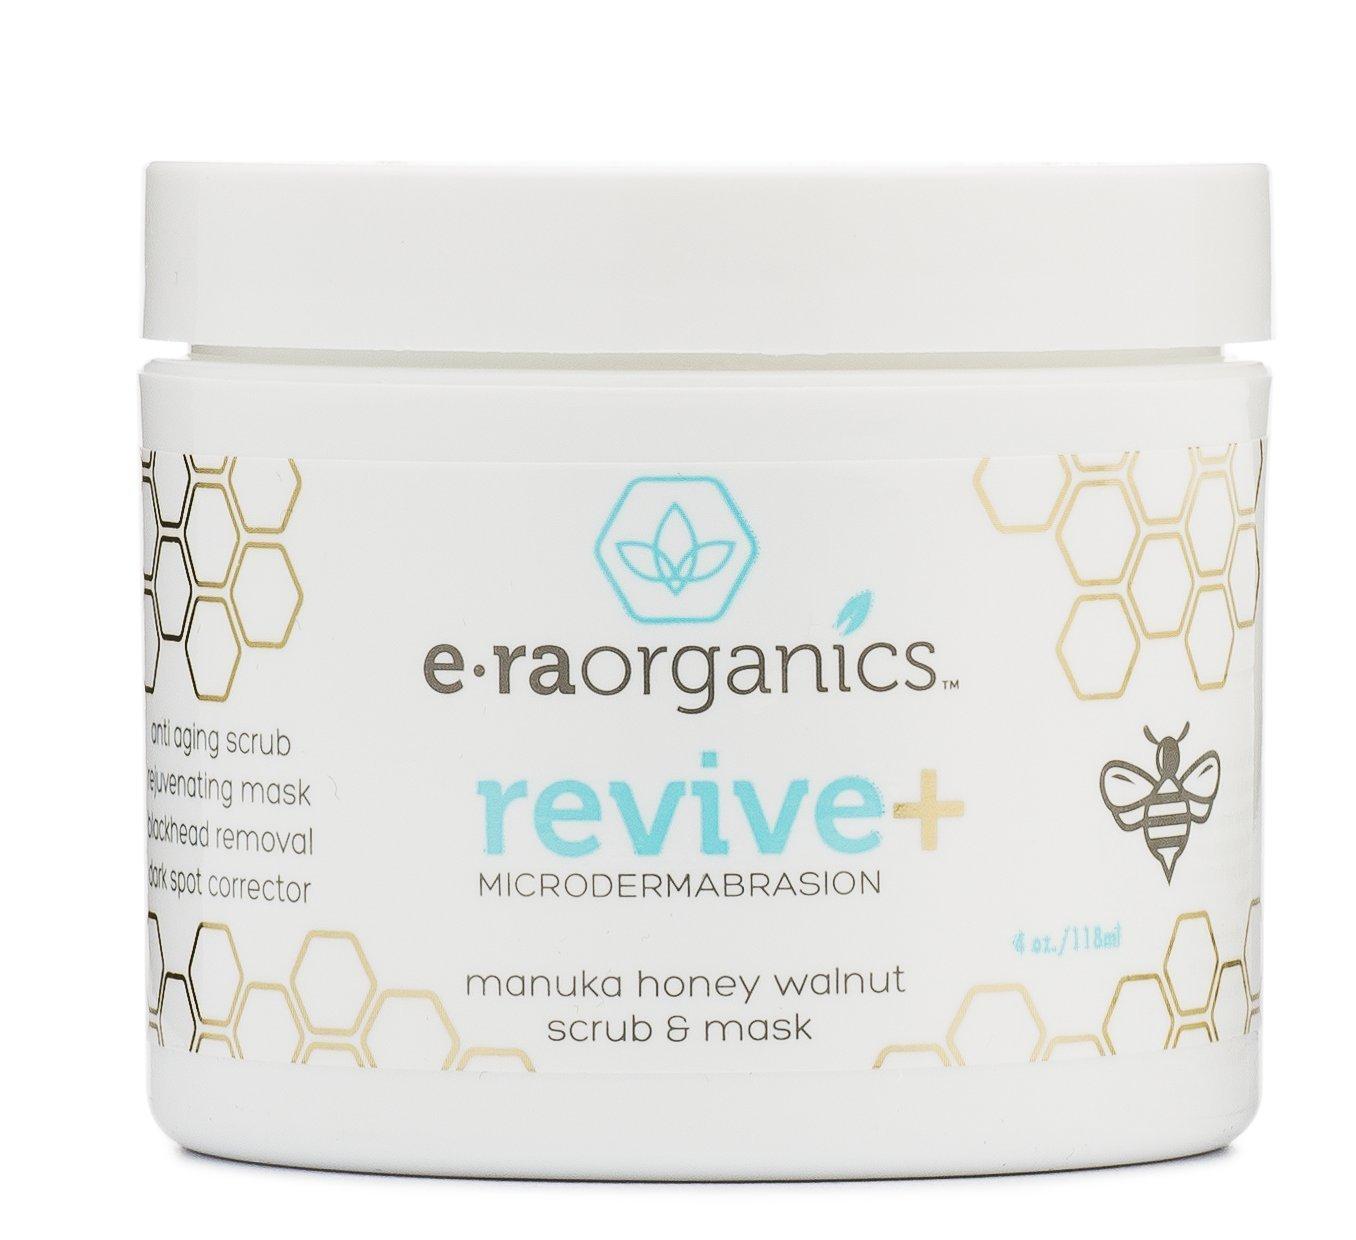 Era Organics Microdermabrasion Facial Scrub and Face Exfoliator